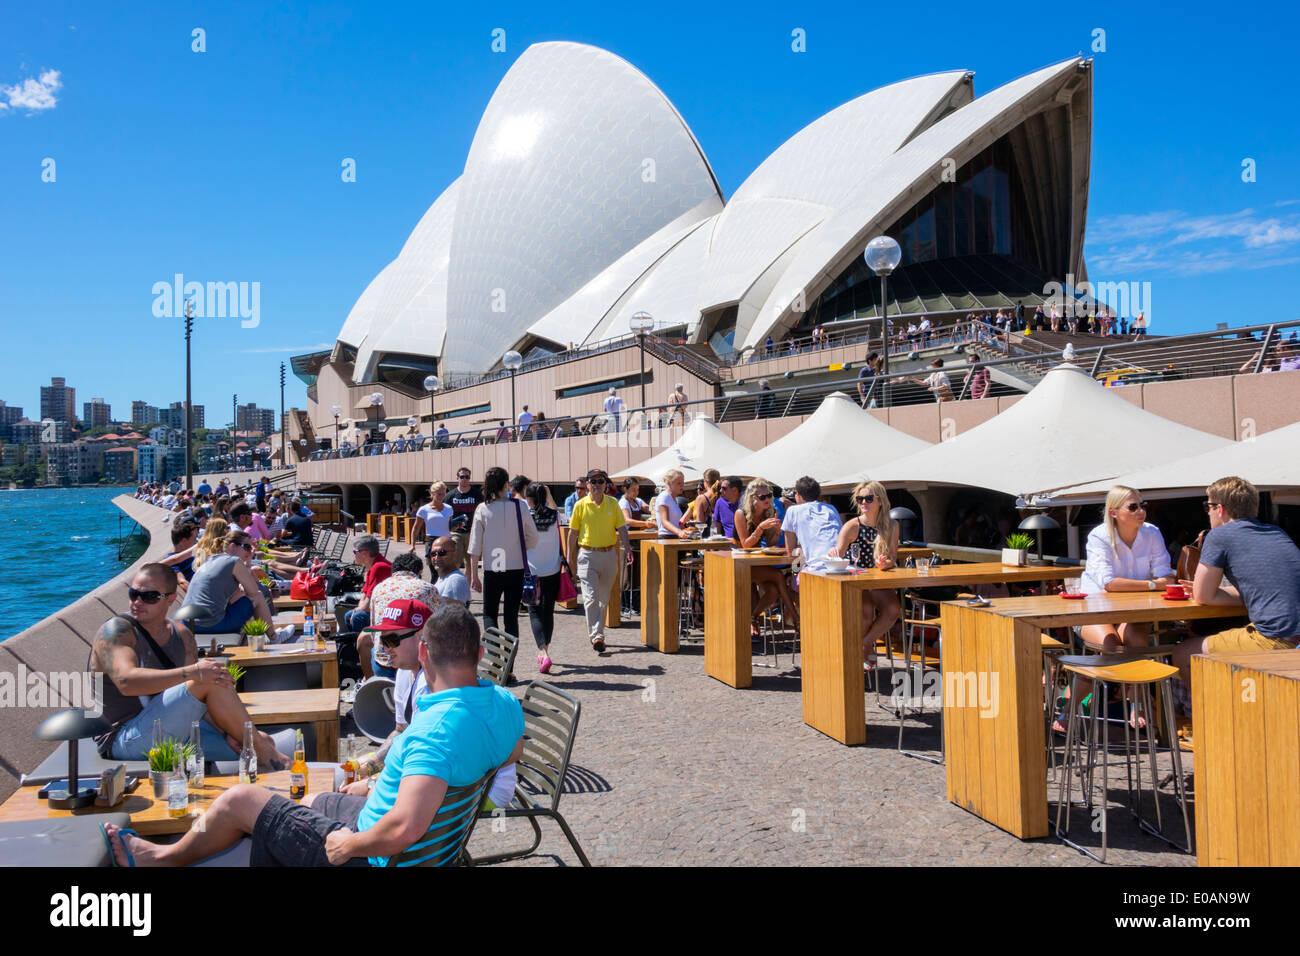 Sydney Australia NSW New South Wales Sydney Harbour harbor East Circular Quay Sydney Opera House promenade Opera Bar restaurant alfresco dining tables - Stock Image